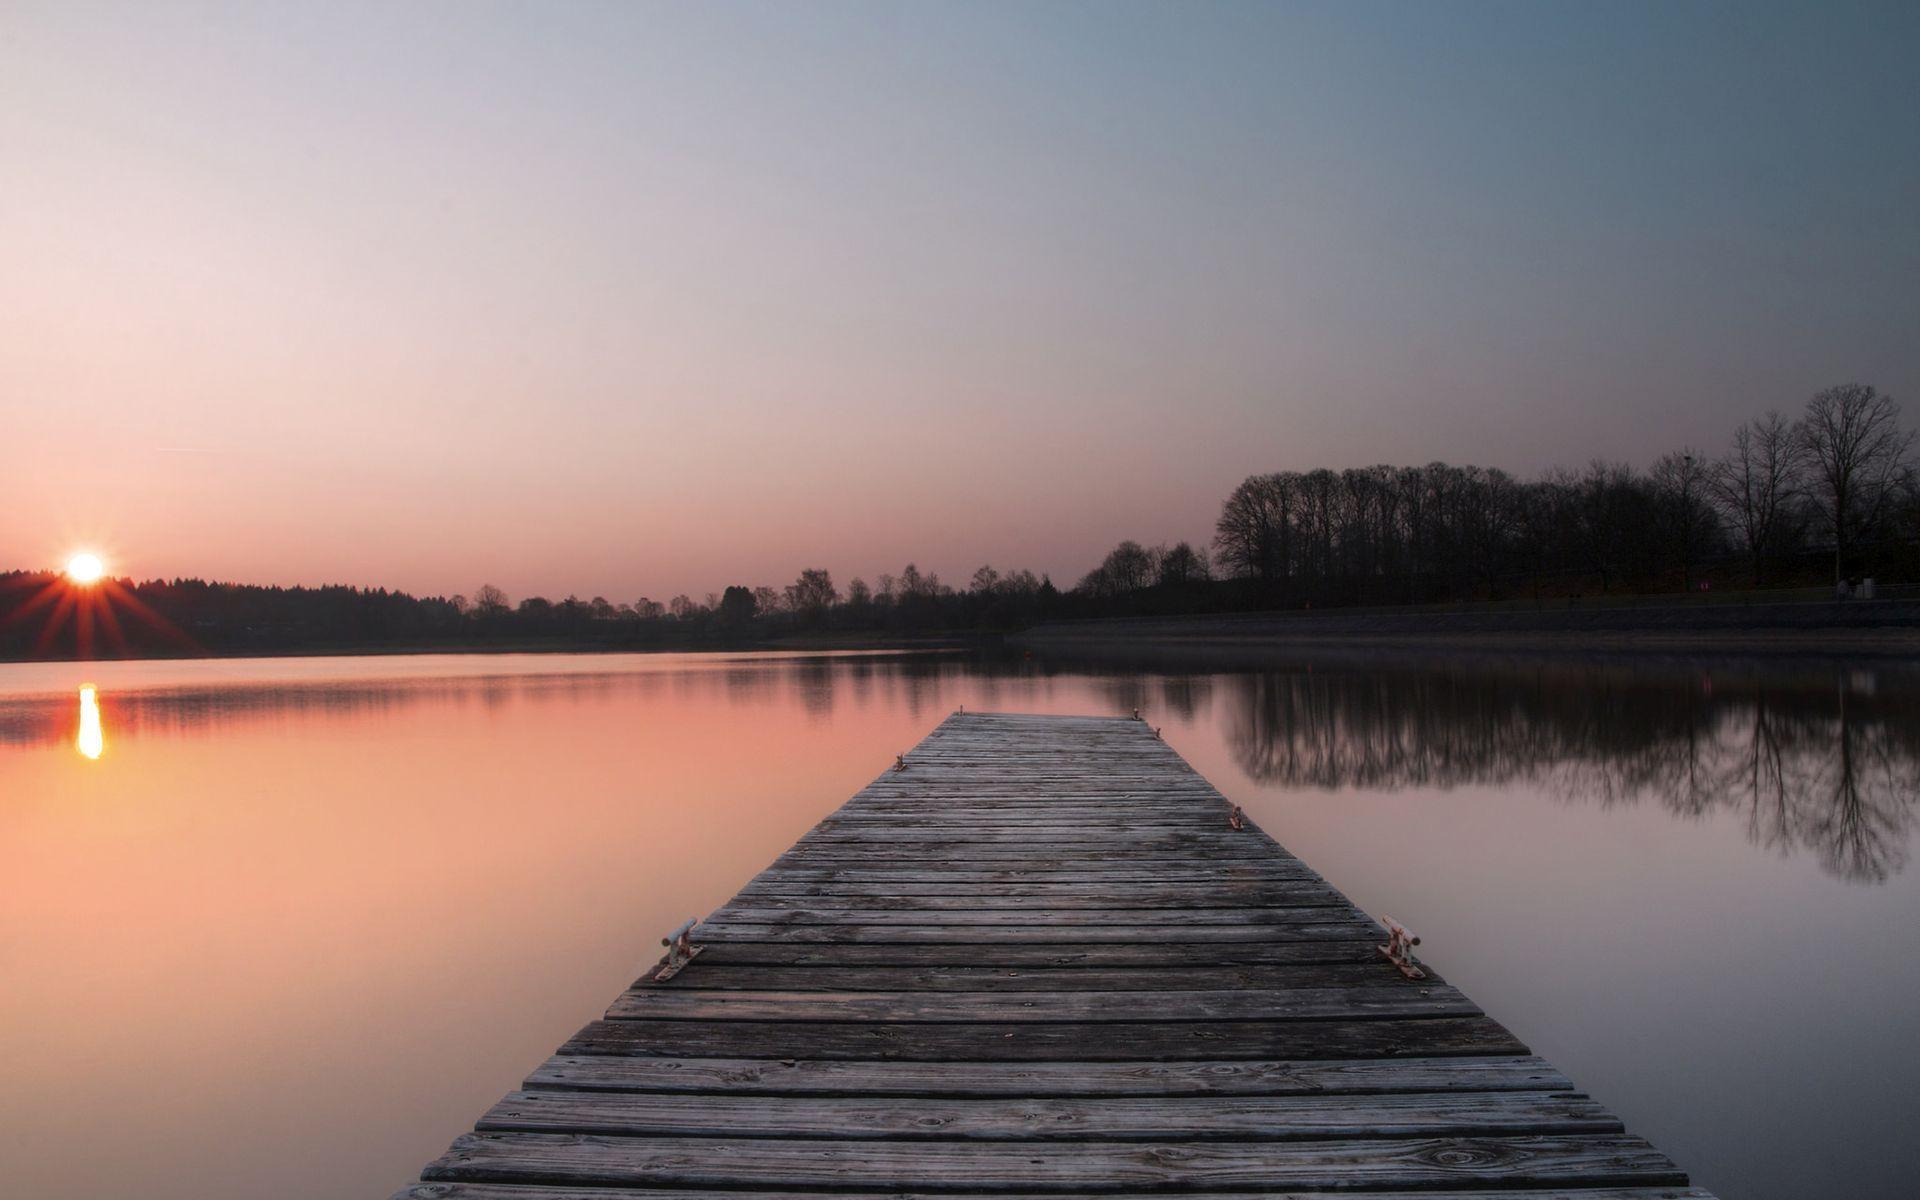 pier-on-the-calm-lake